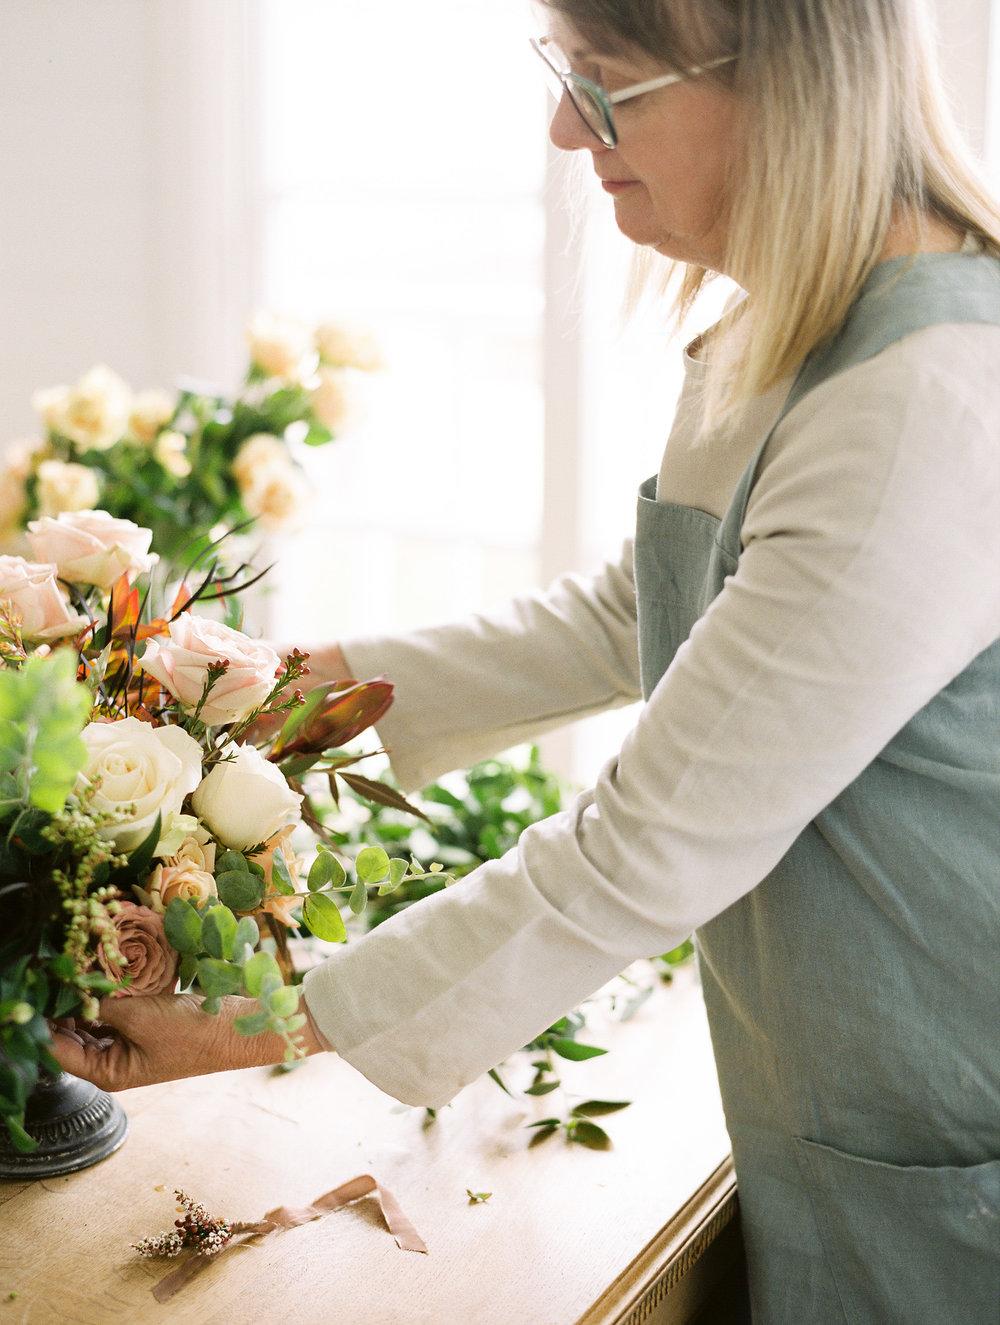 sandra-chau-stylist-floral-florist-branding-lifestyle-shoot-we-are-origami206.jpg